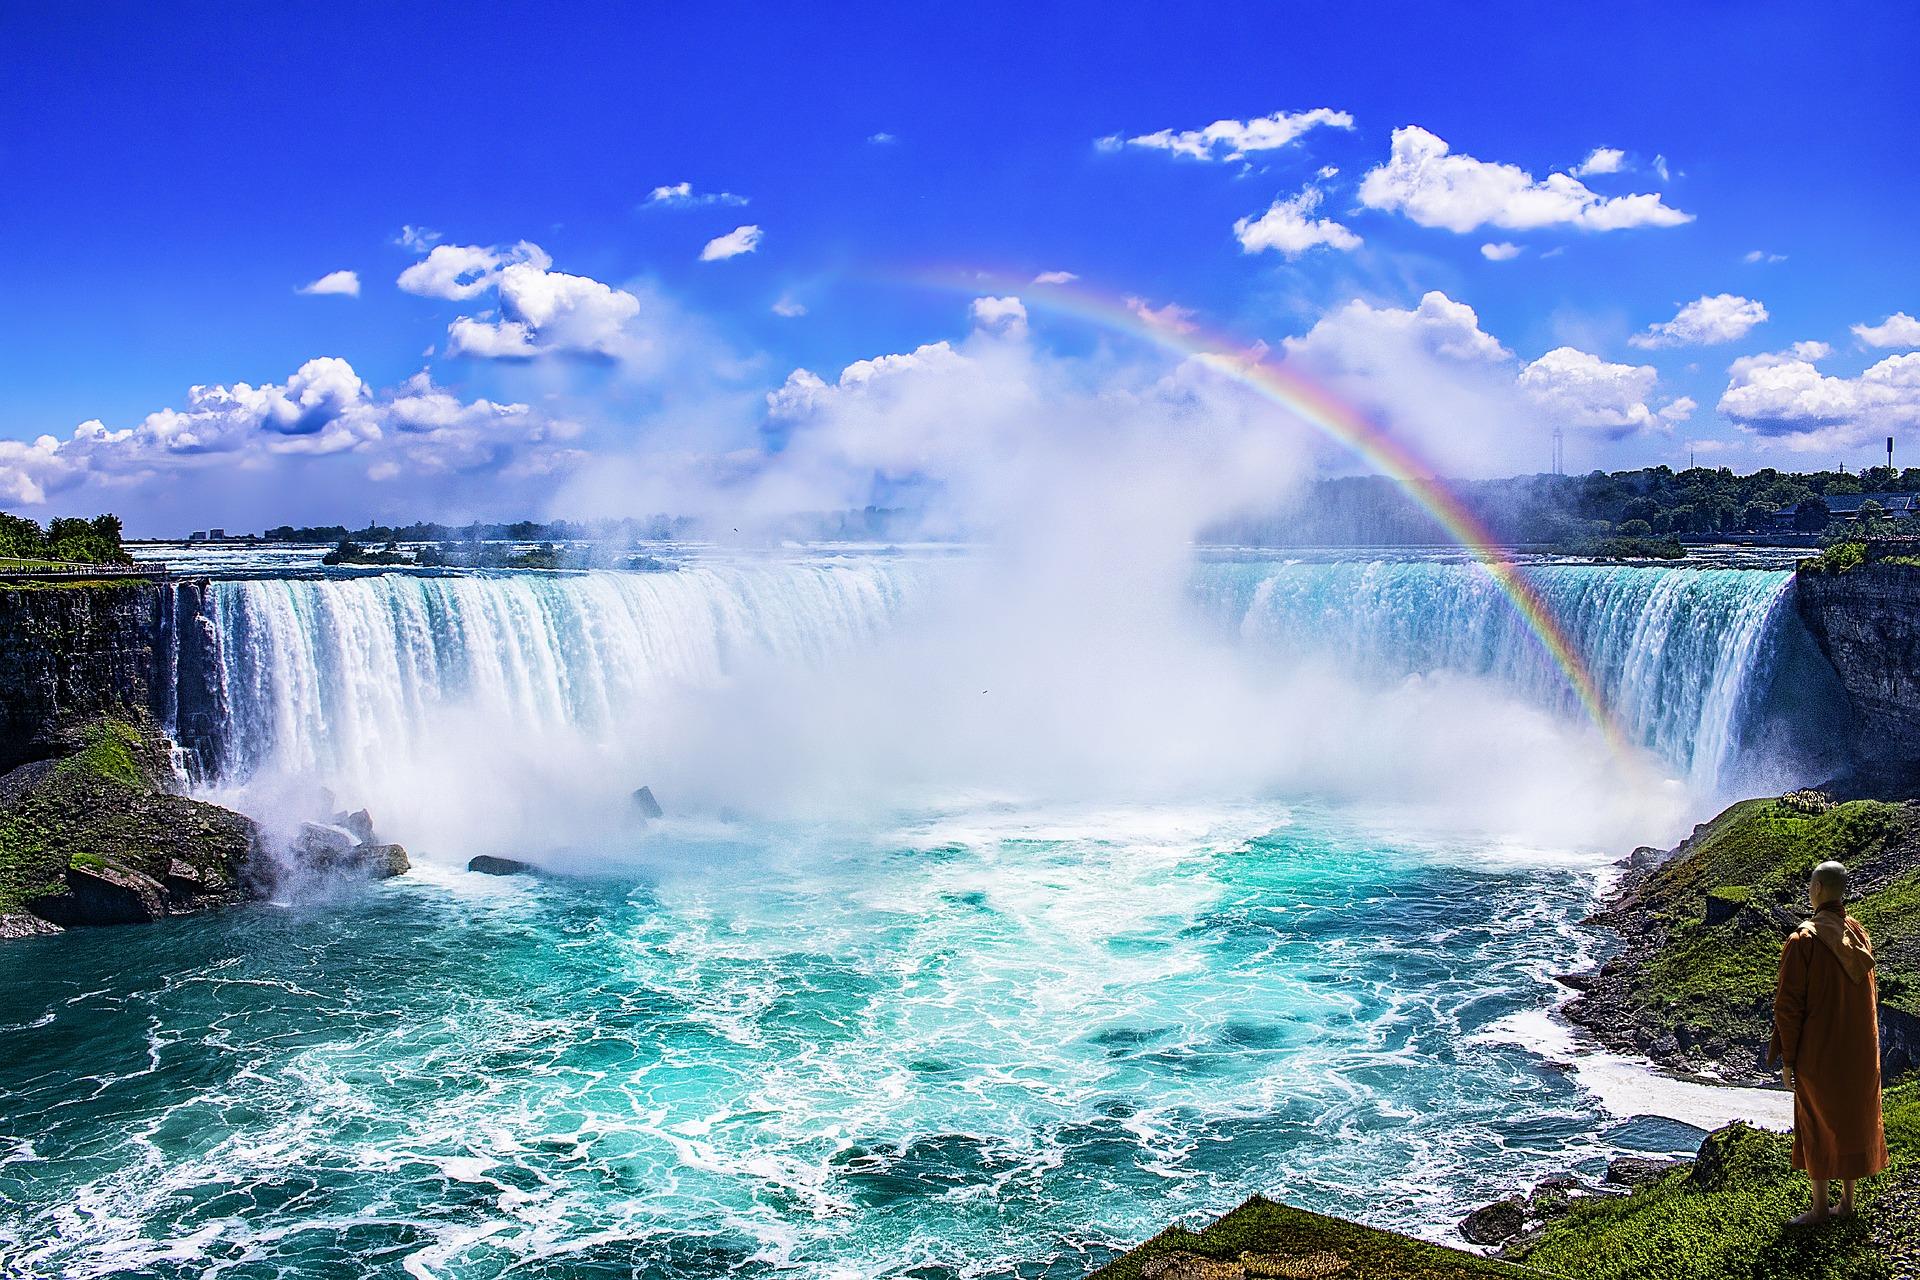 Minitour Niagara Falls